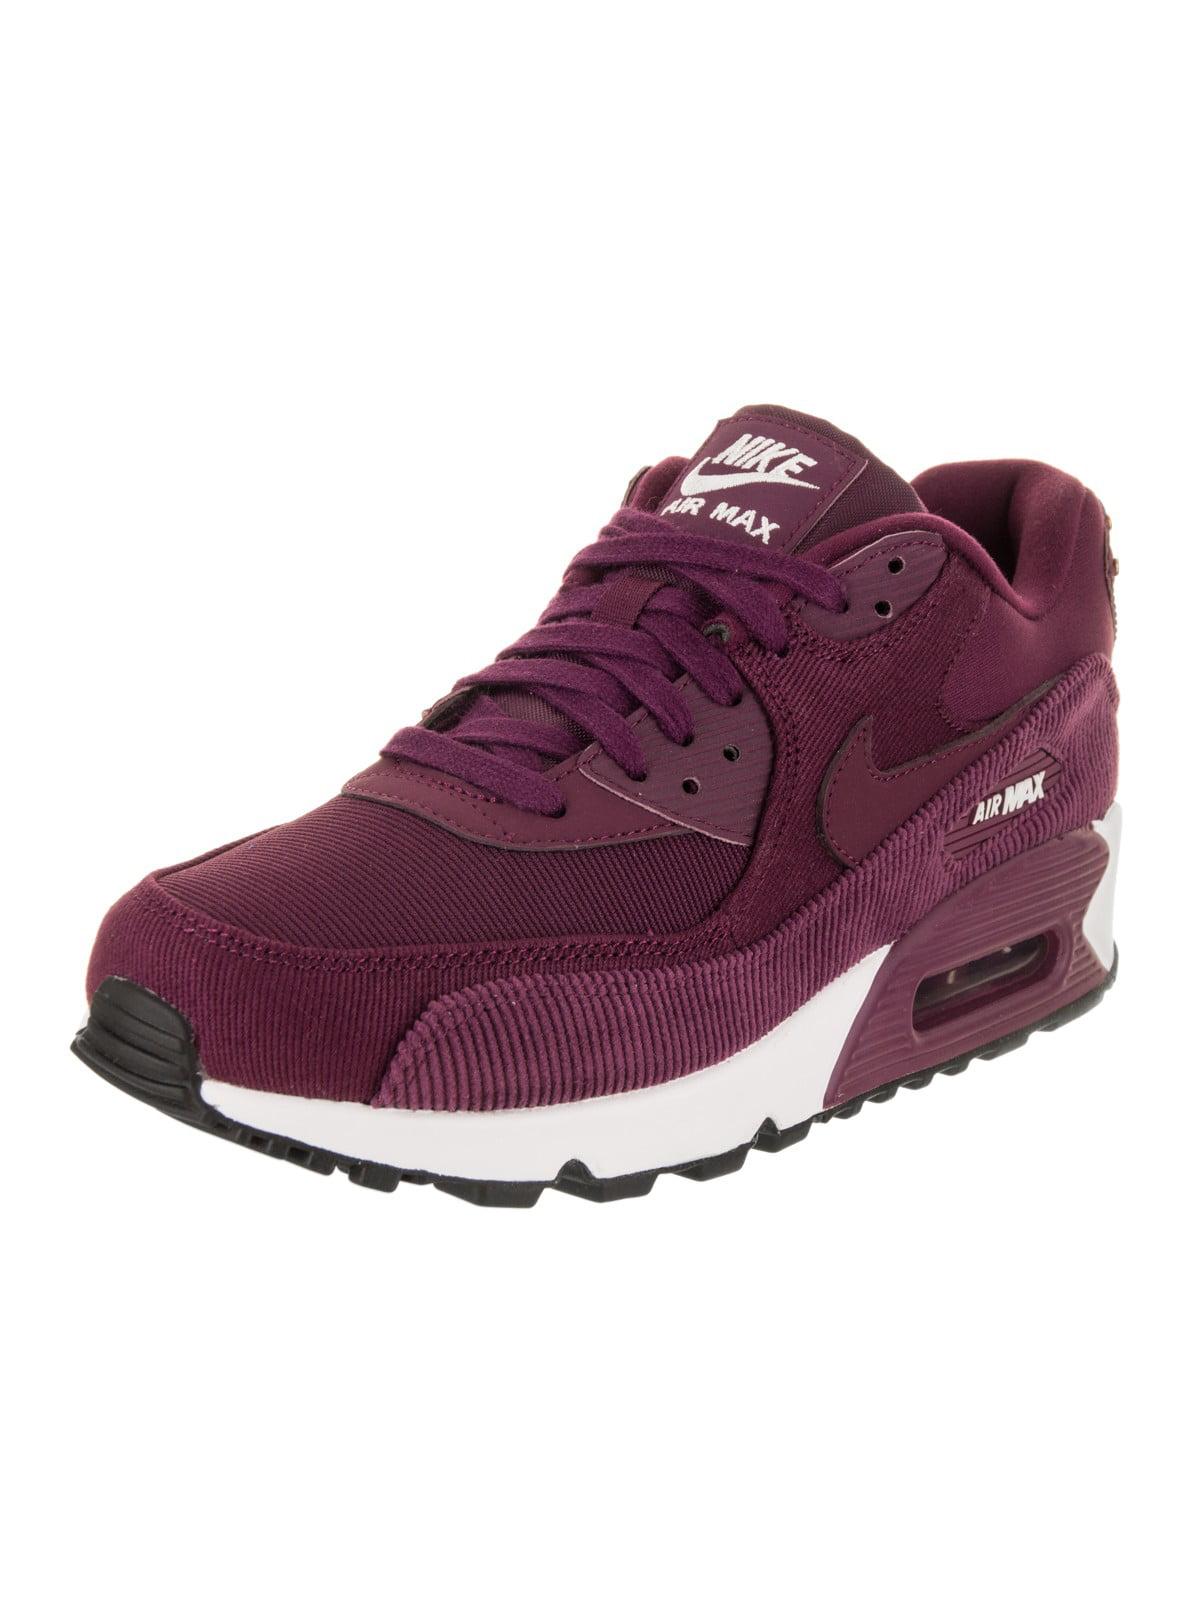 Gentleman/Lady: Running Nike Women's Air Max 90 Leather Running Gentleman/Lady: Shoe:  superb processing 265a39